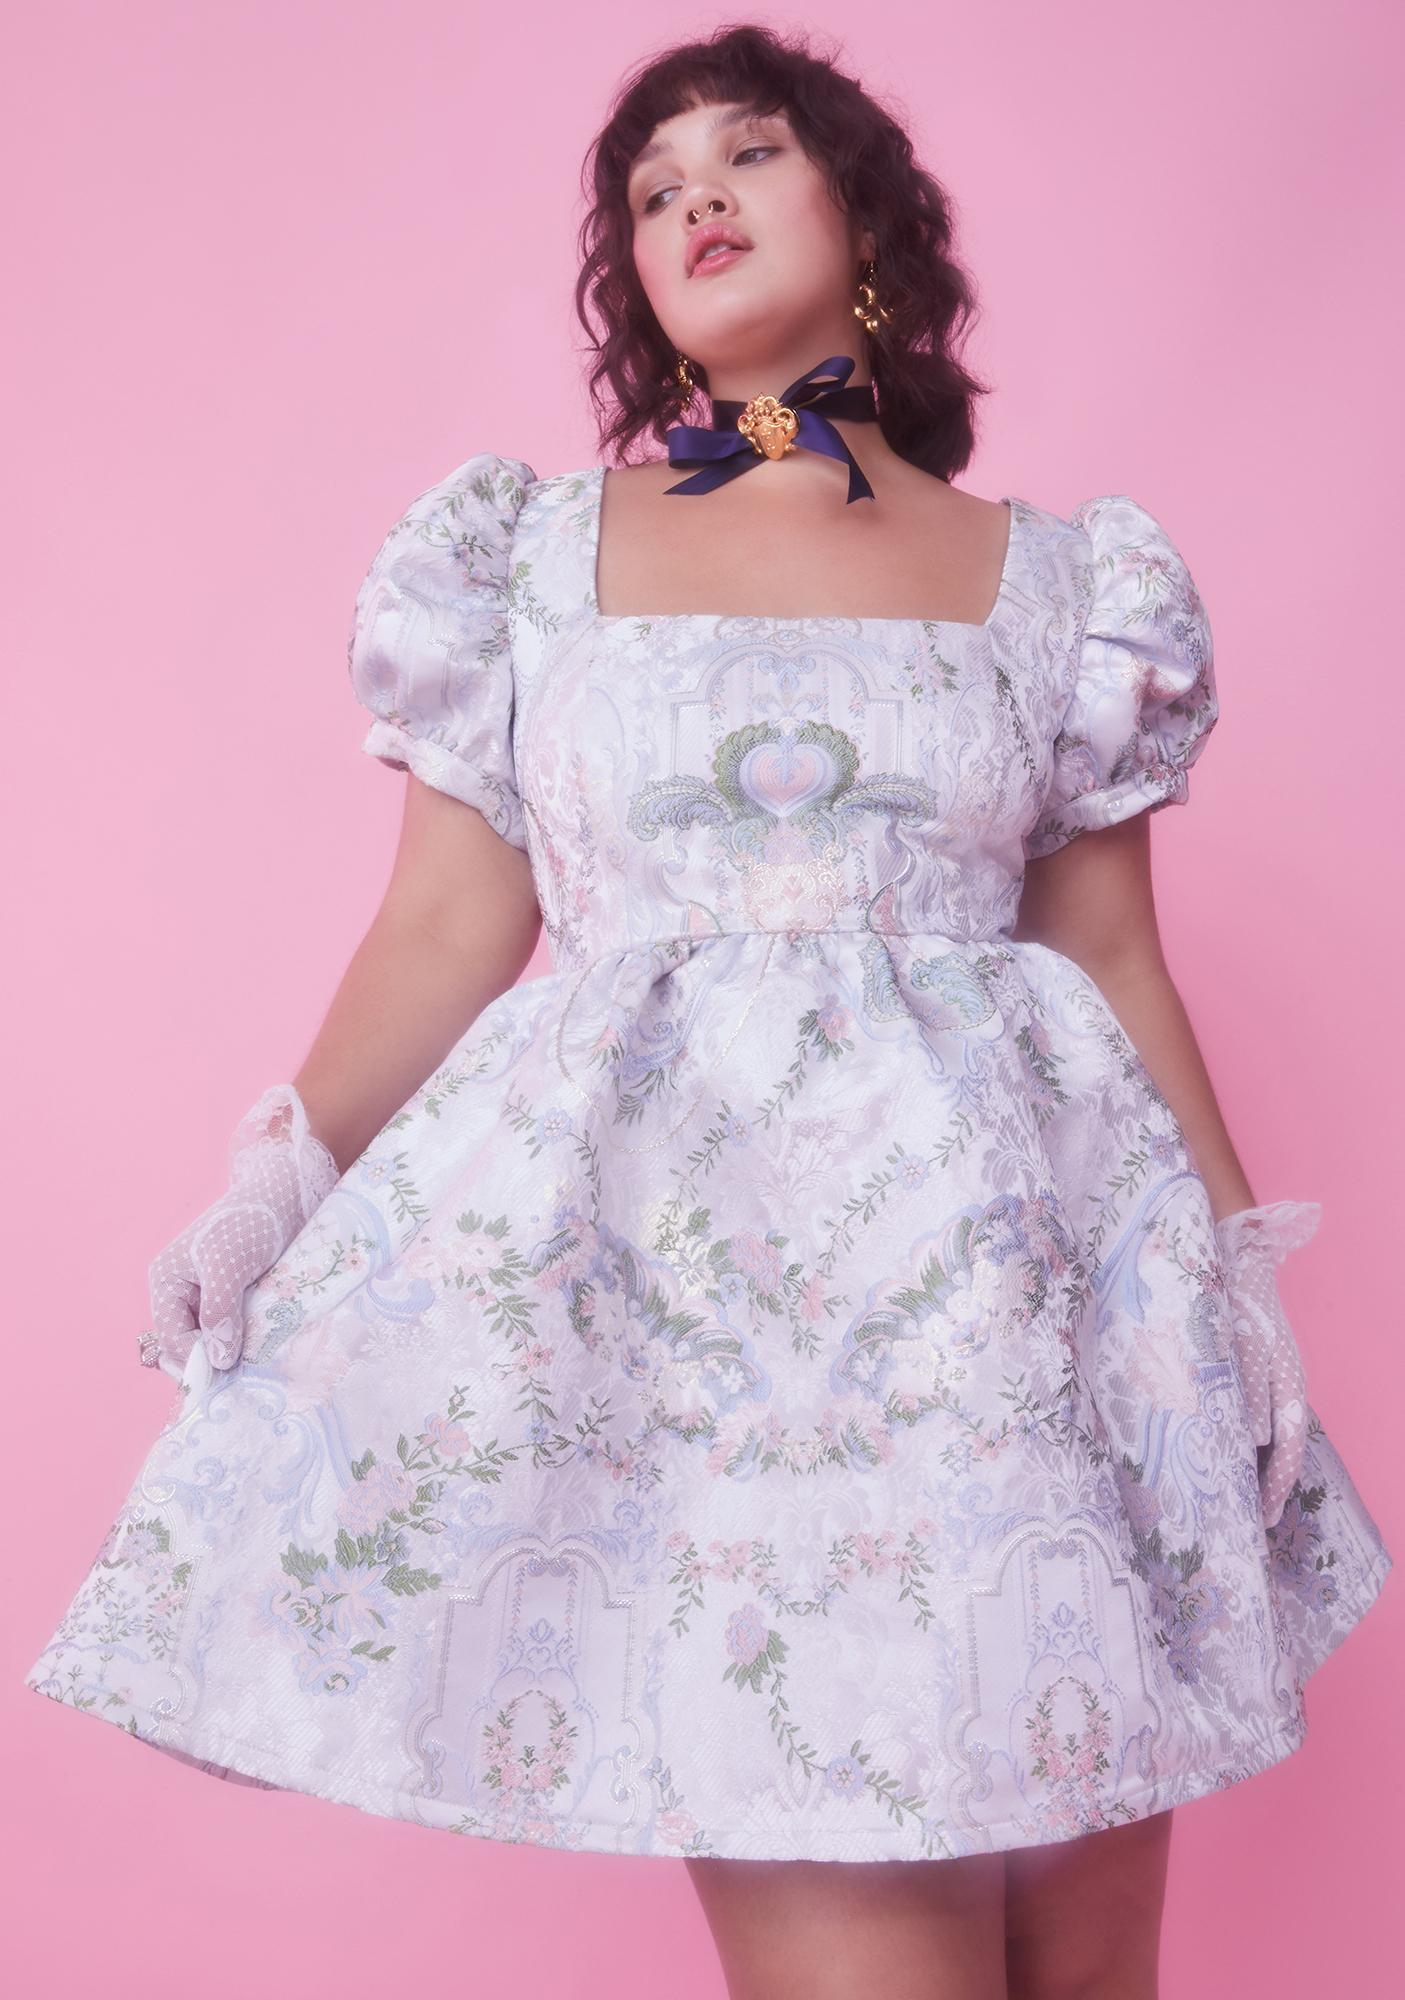 Sugar Thrillz Honey If The Shoe Fits Brocade Dress